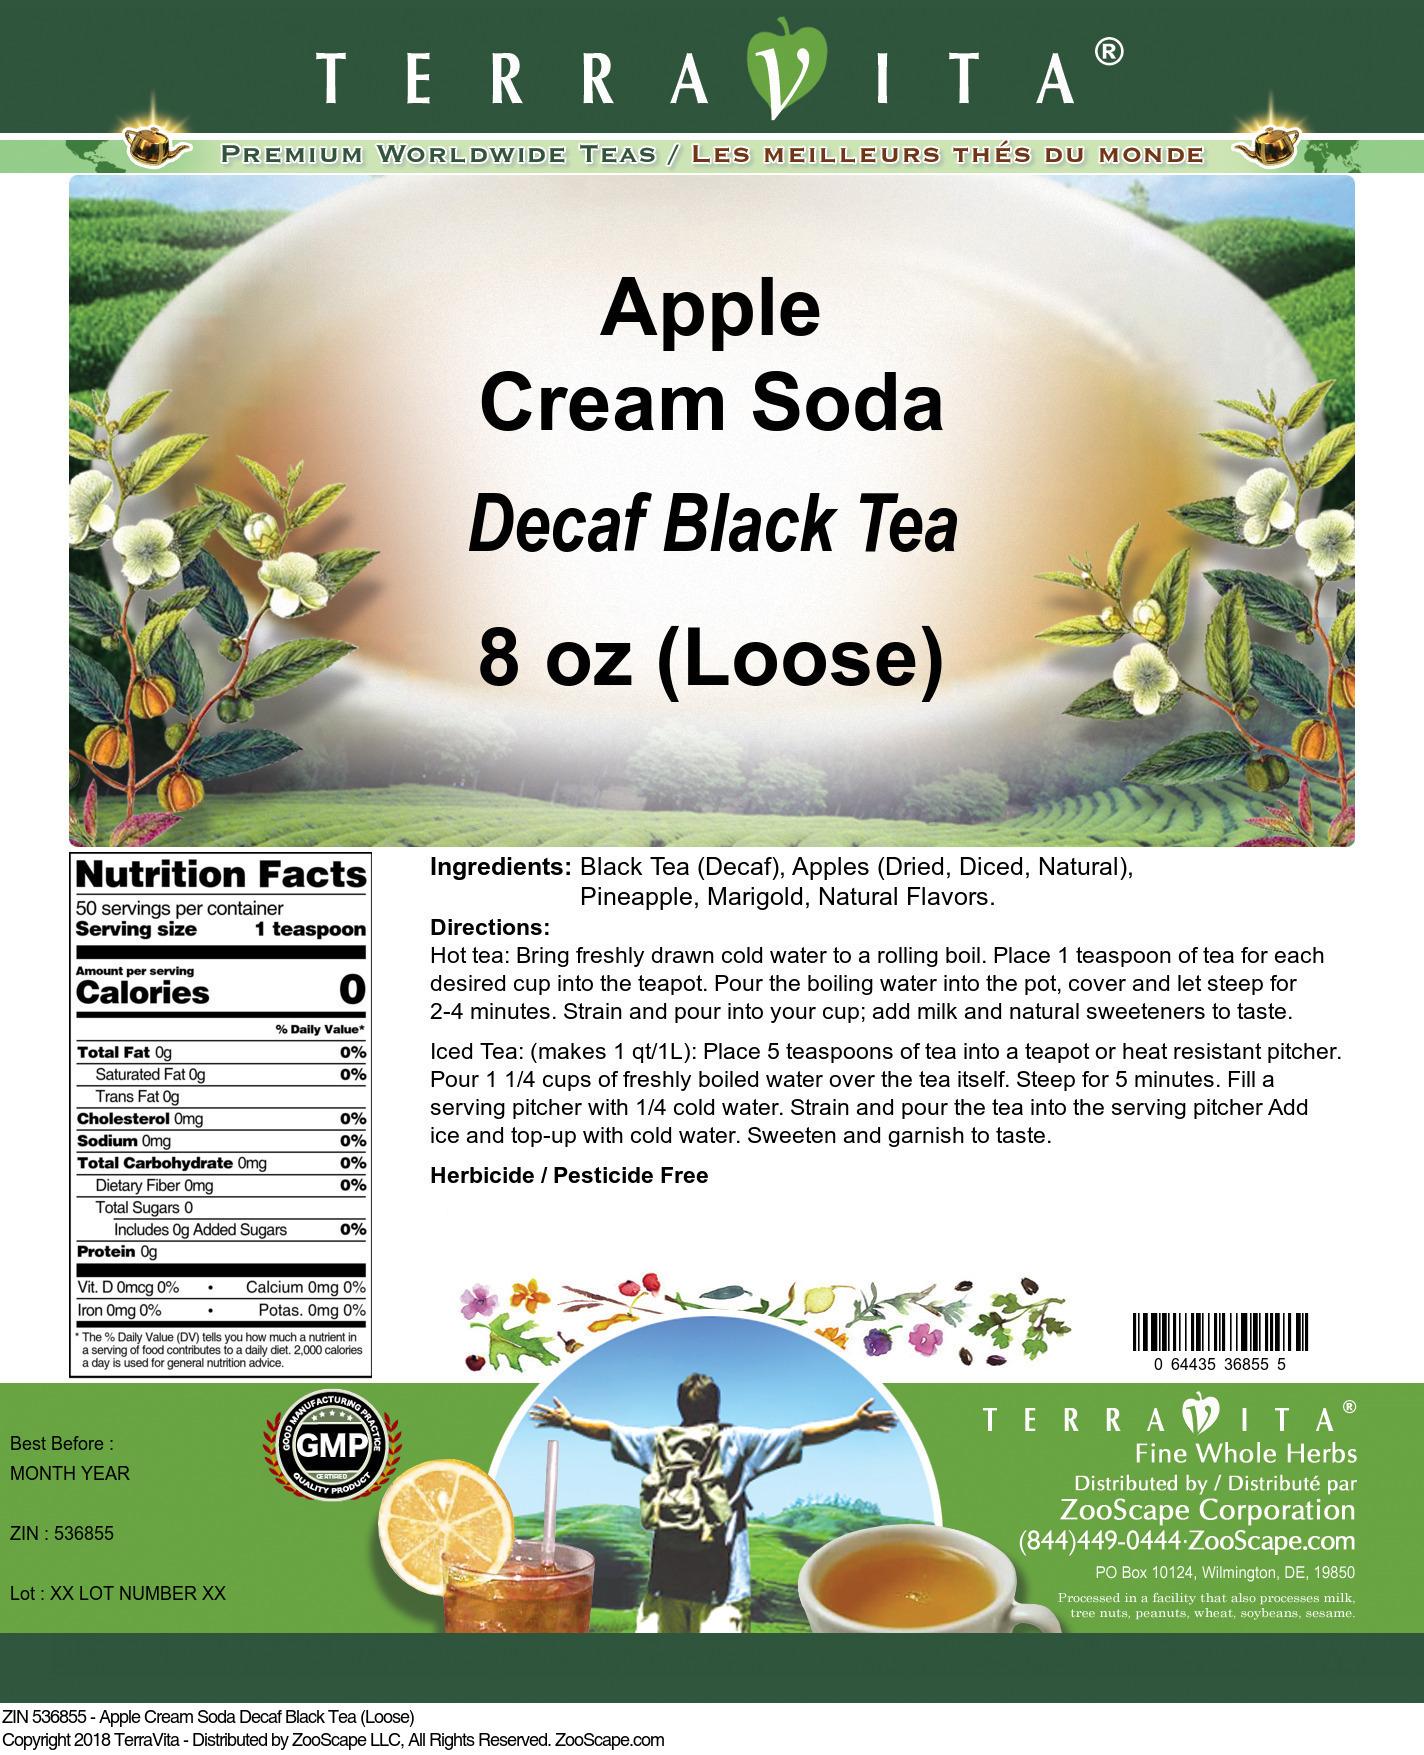 Apple Cream Soda Decaf Black Tea